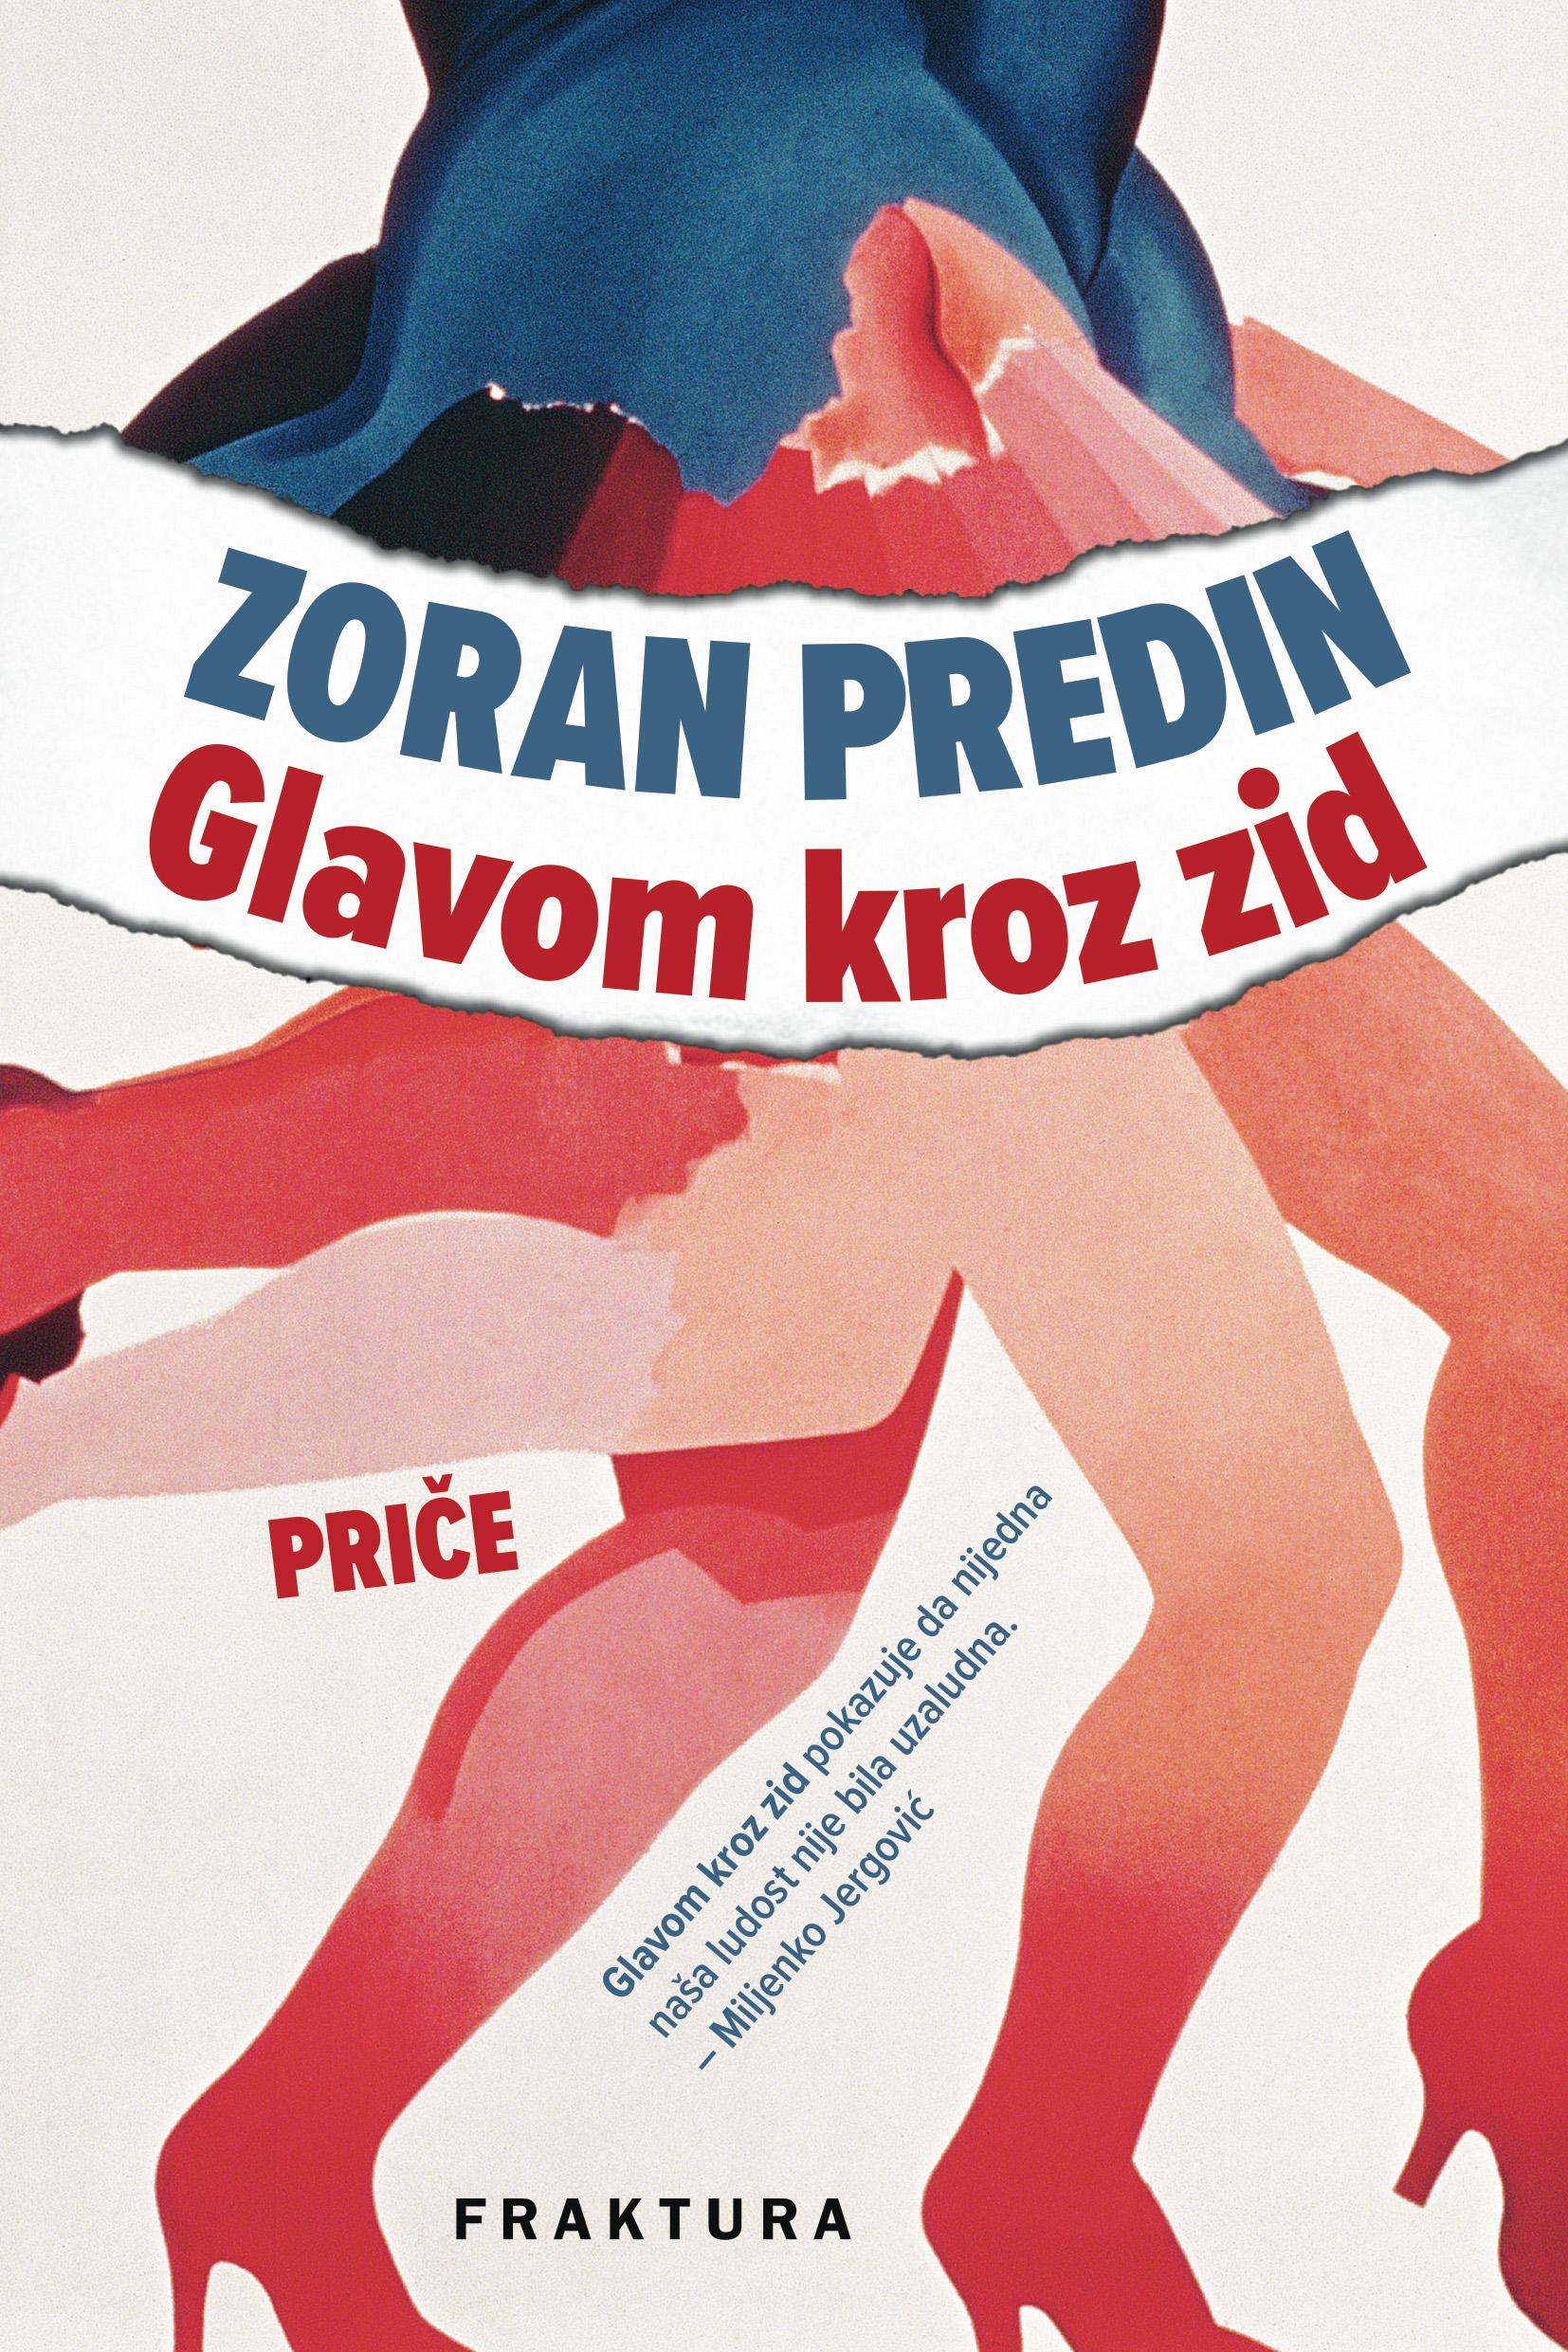 Zoran Predin na 23. HGF-u